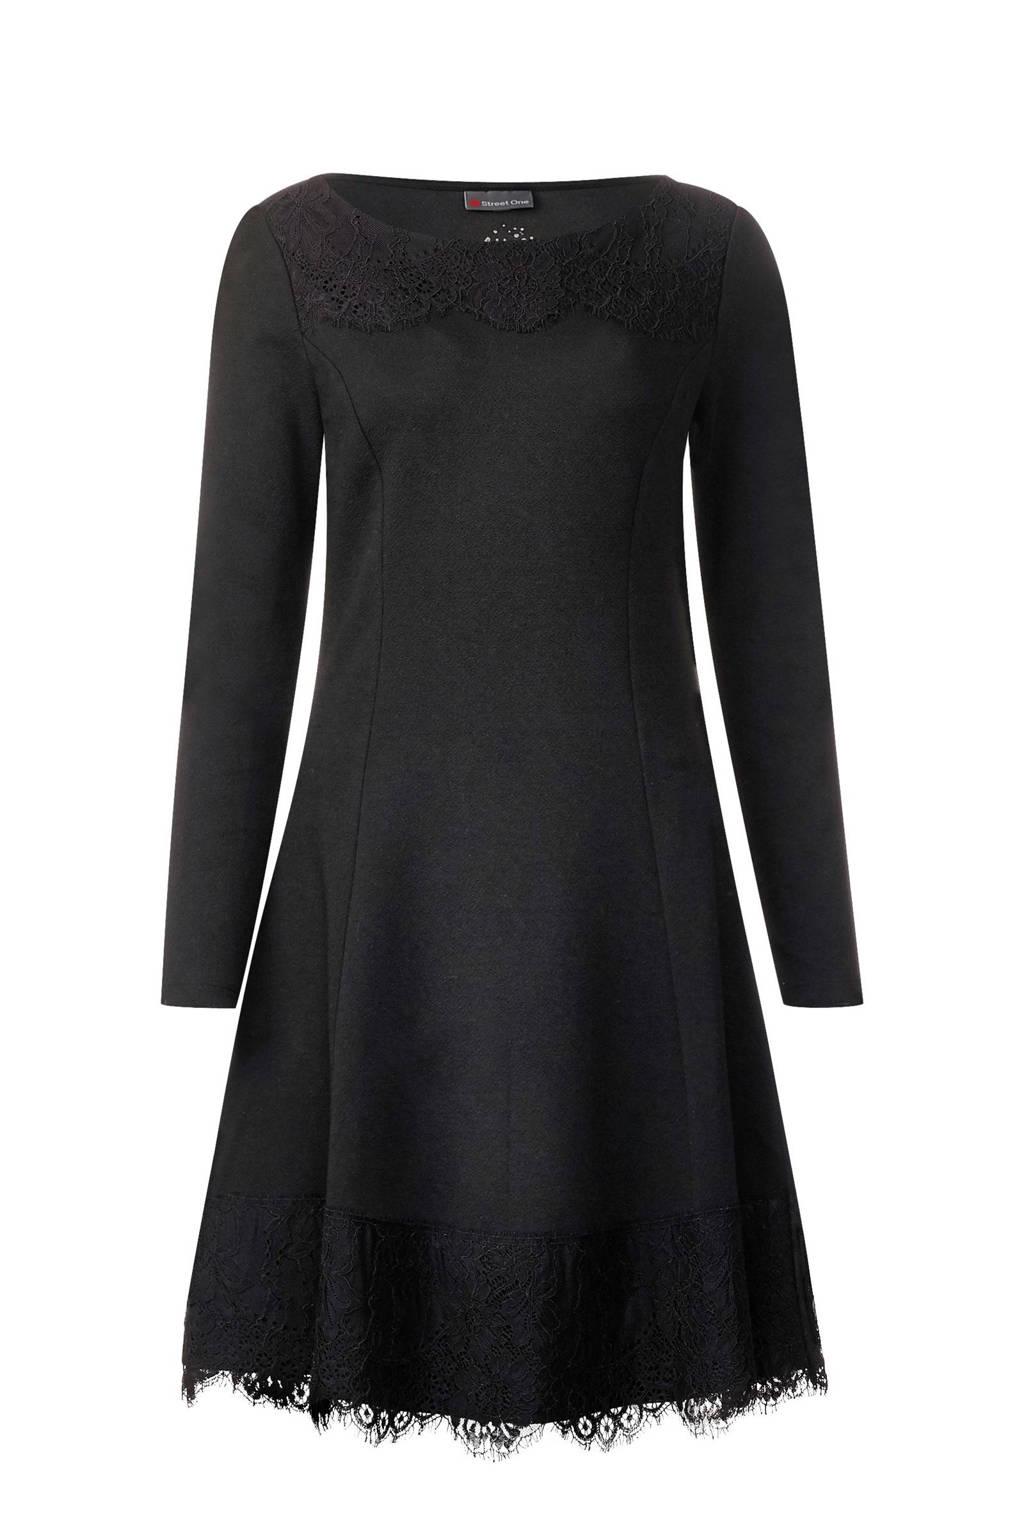 Street One jurk met kant, Zwart